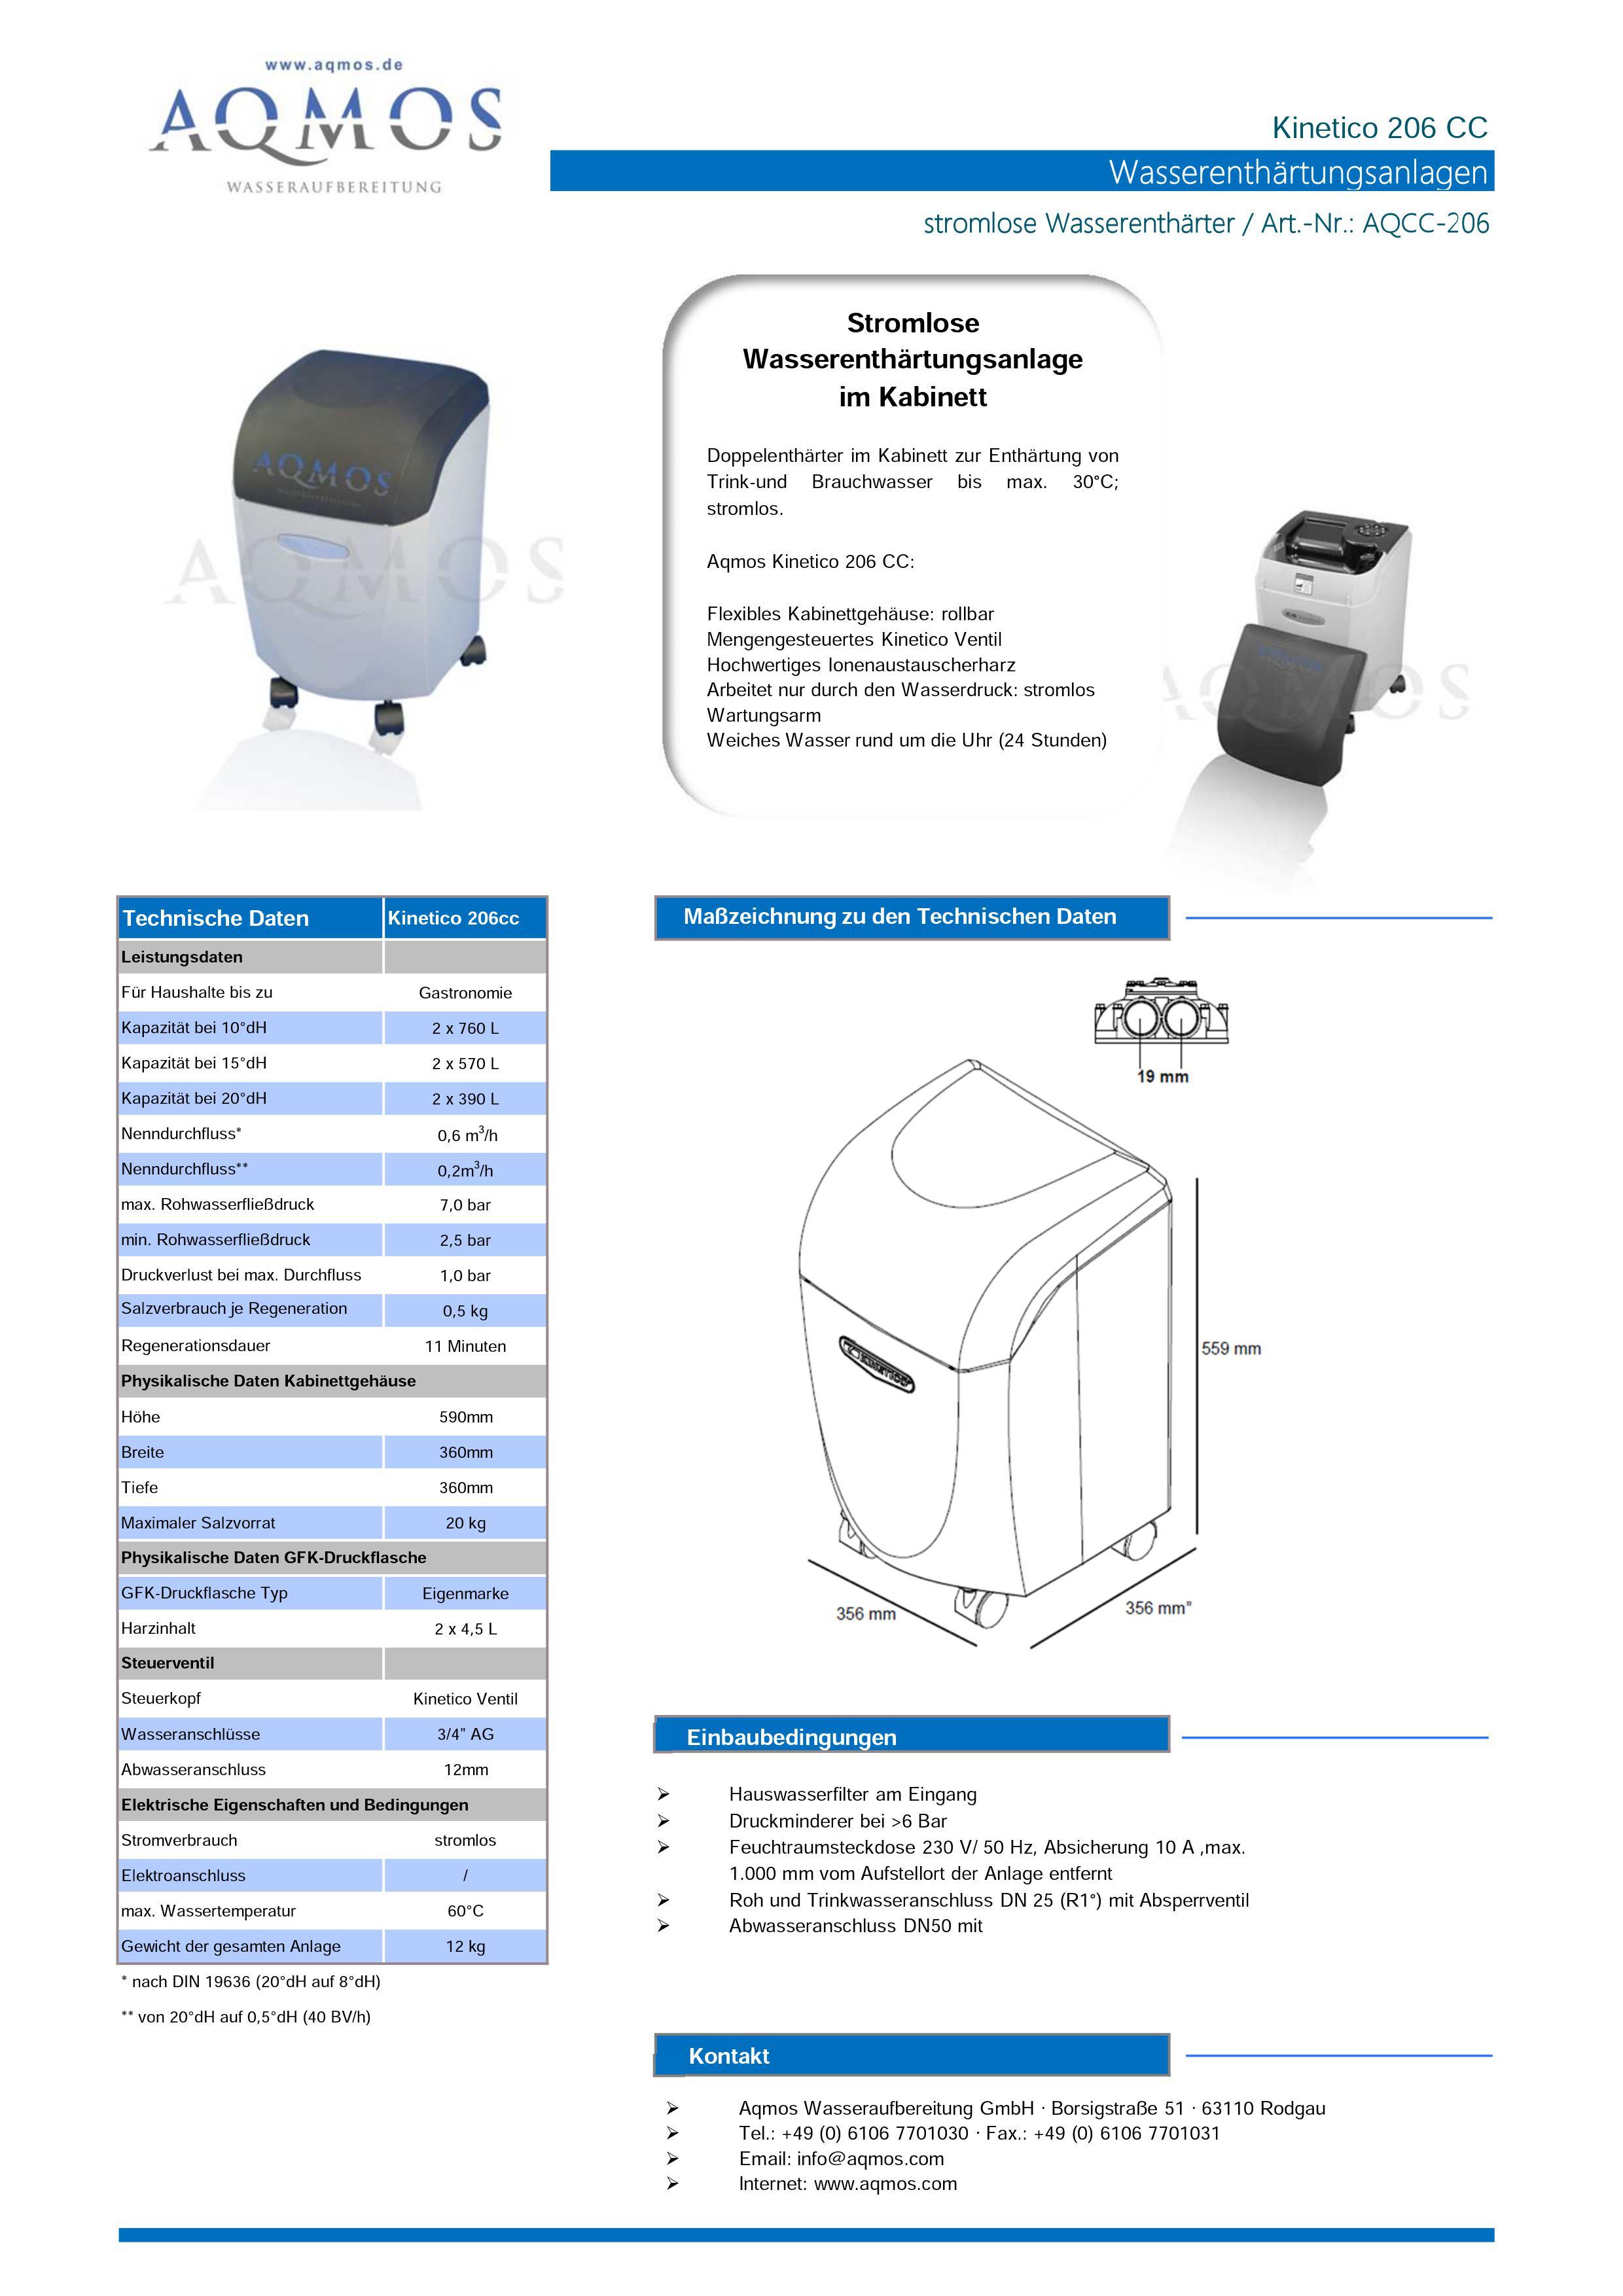 Kinetico-206-CC-Datenblatt